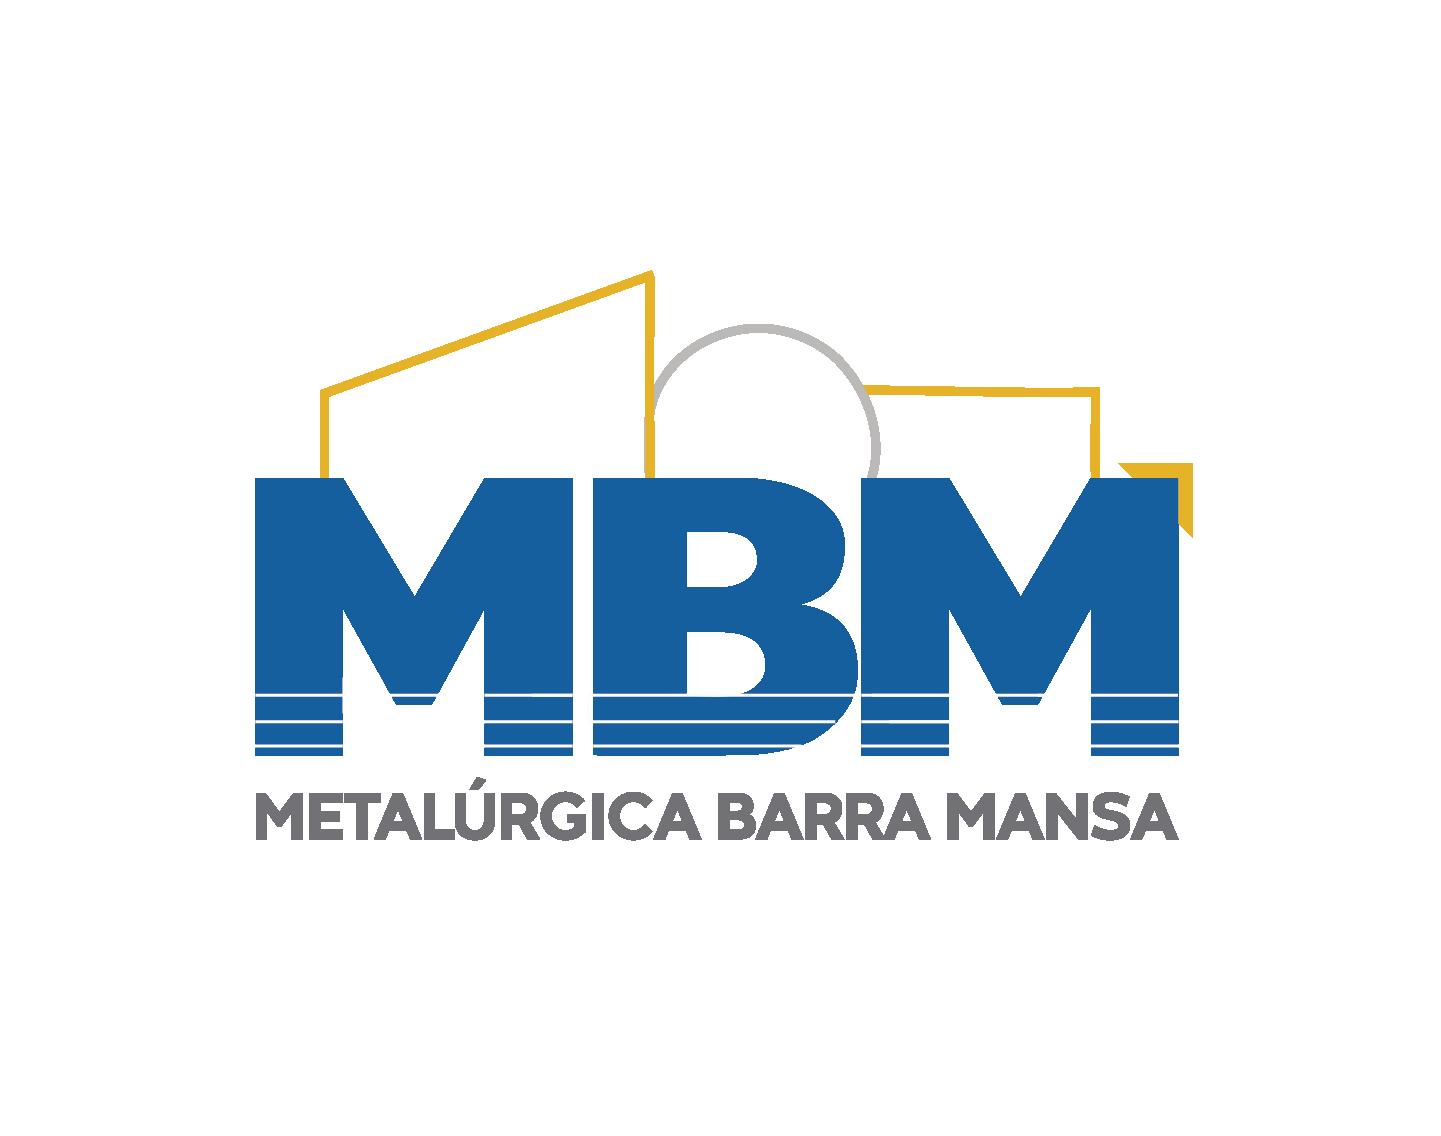 Metalúrgia Barra Mansa